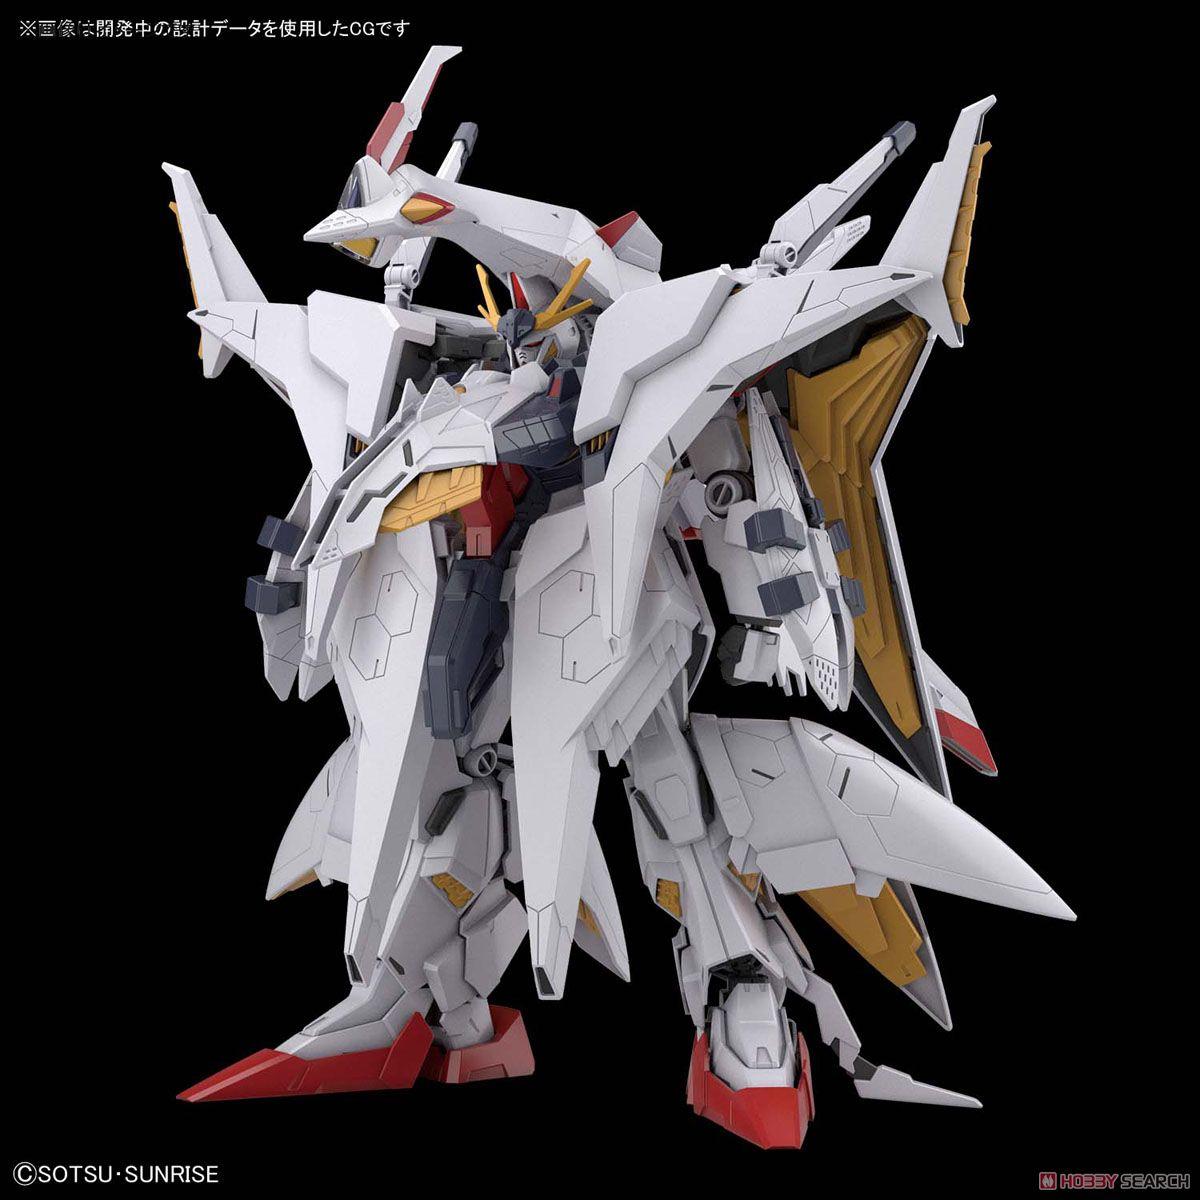 HGUC 1/144『ペーネロペー』機動戦士ガンダム 閃光のハサウェイ プラモデル-014